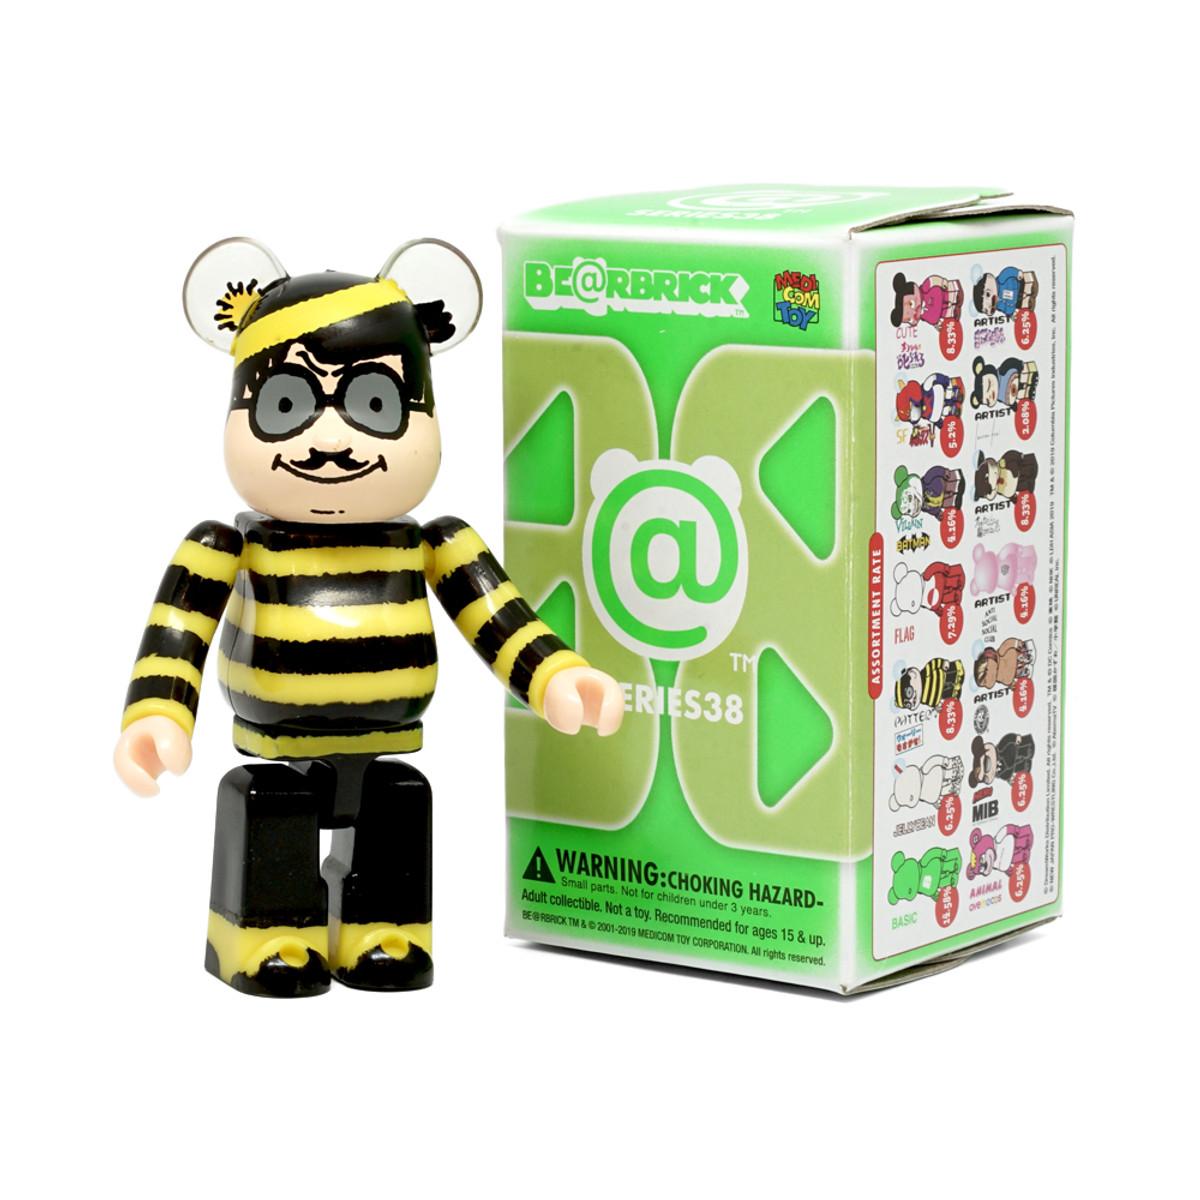 Medicom Bearbrick Be@rbrick 100/% Series 38 Basic Small B Green S38 Toy